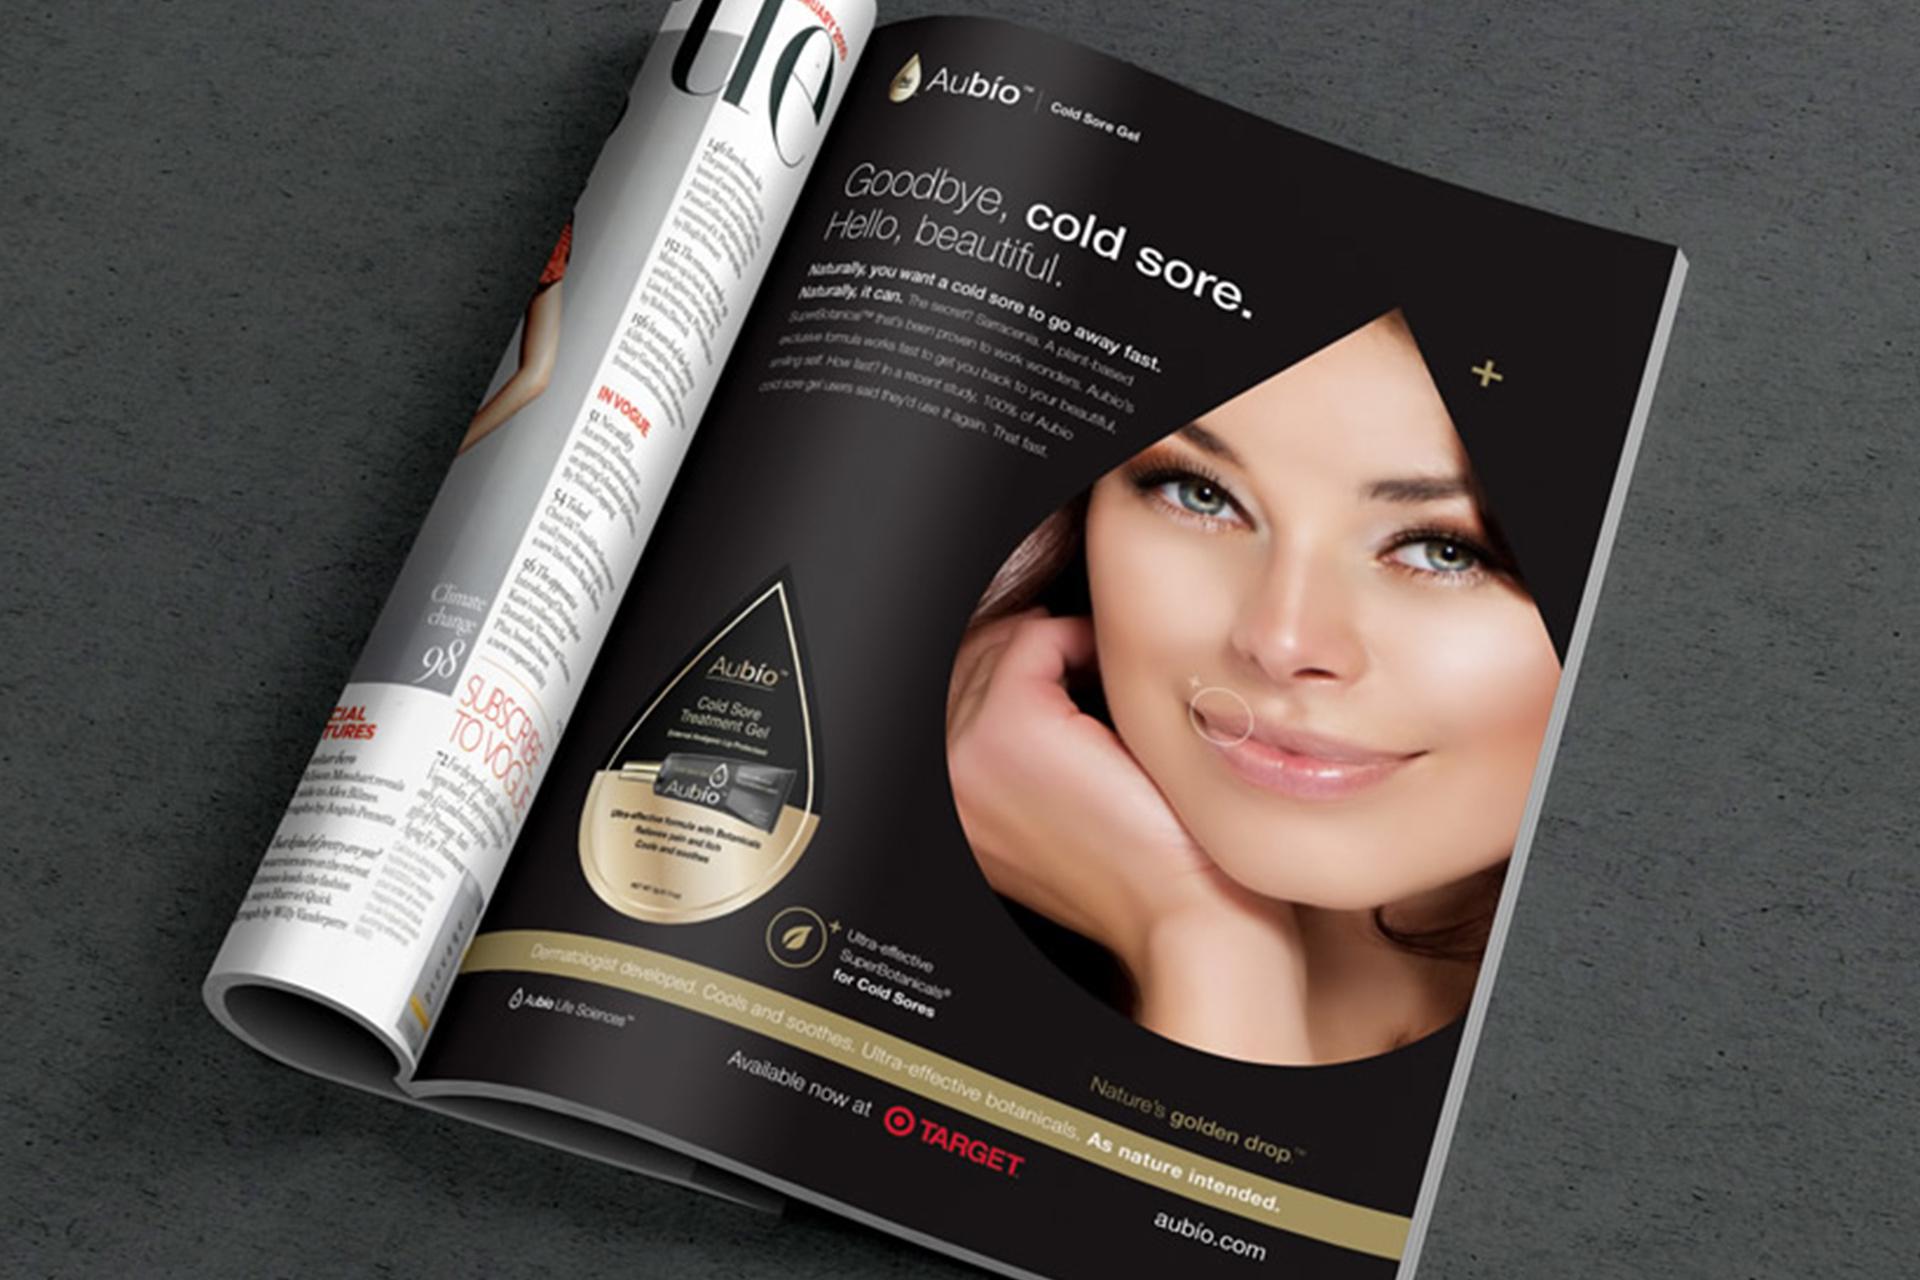 Aubio Cold Sore Gel Advertising Campaign